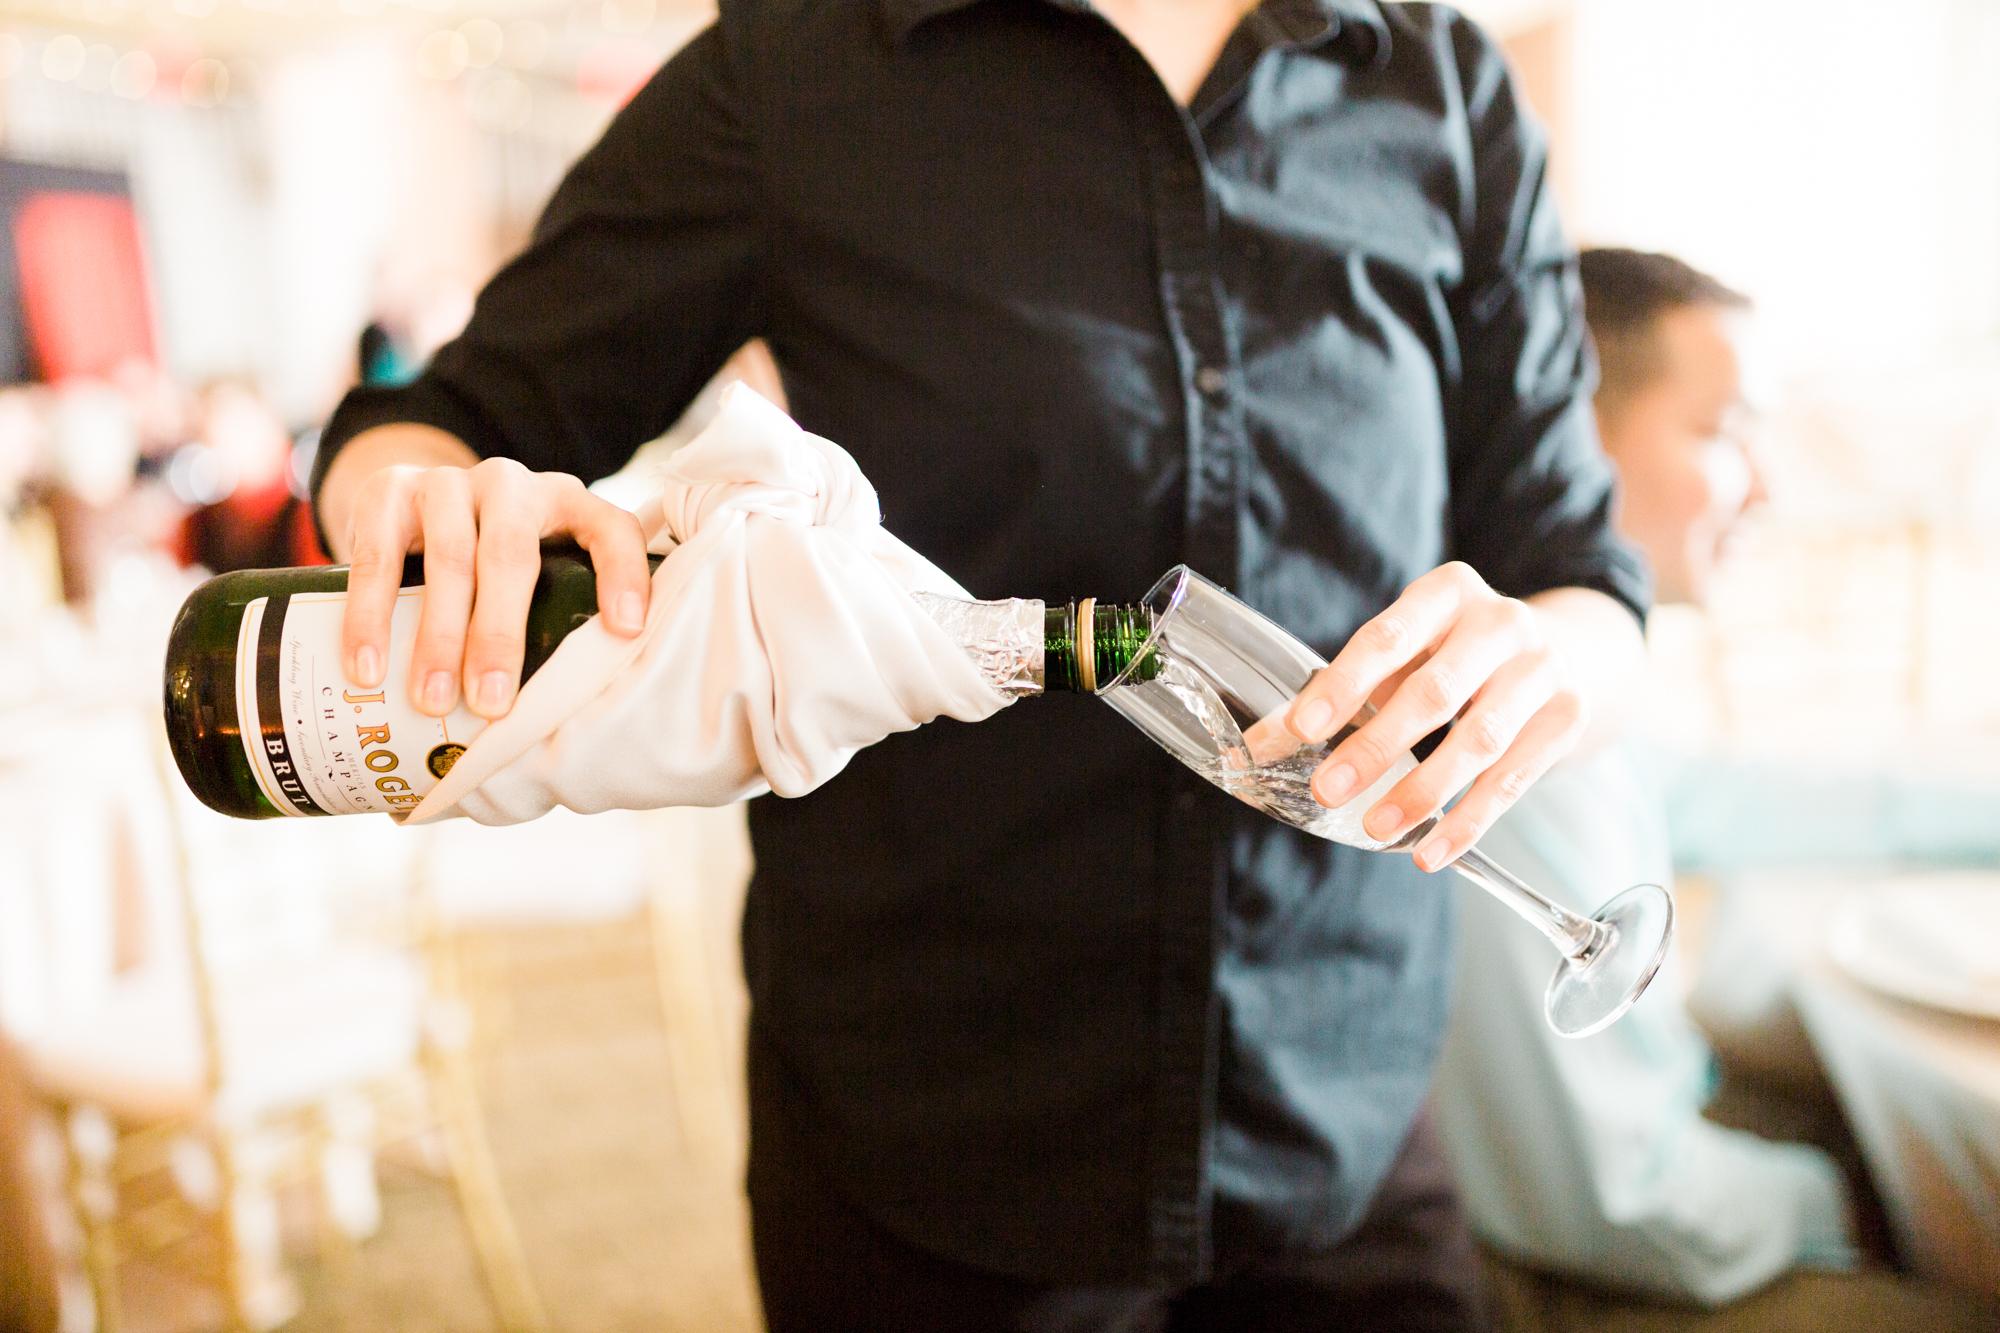 jessica-bellinger-photography-harmony-golf-preserve-wedding-photos-9499.jpg